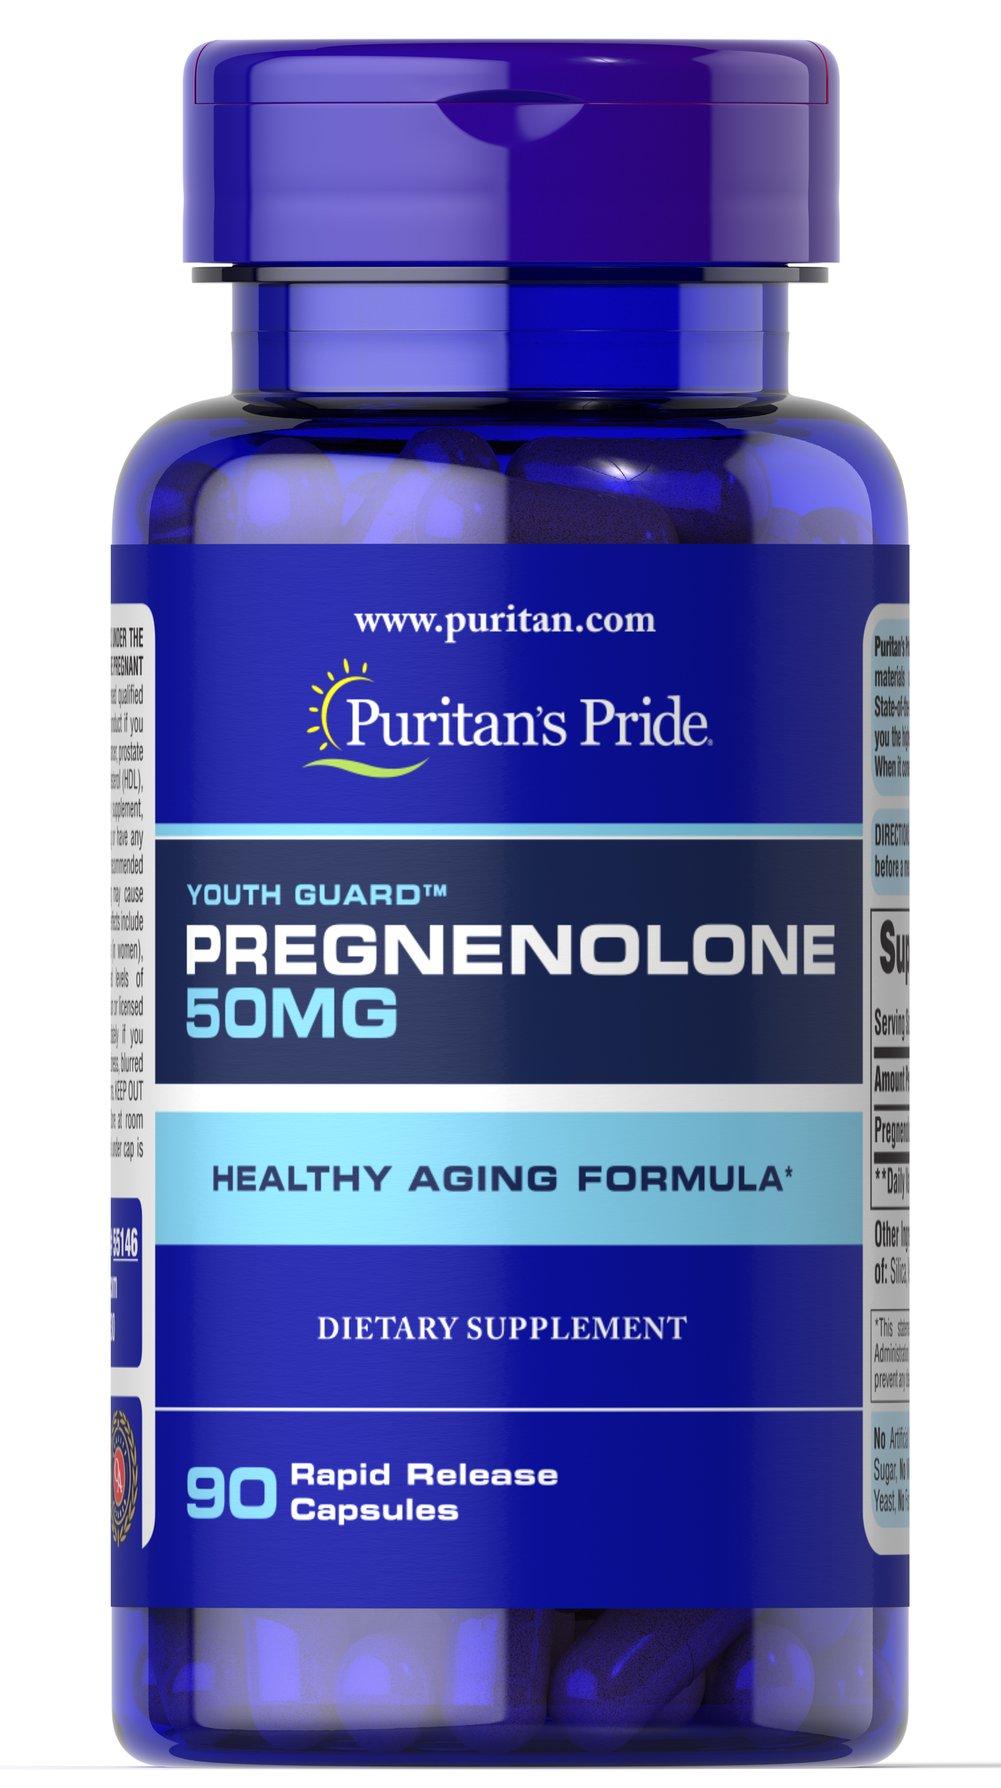 Sallutar Suplementos Pregnenolone 50mg 90 capsDescriçäo Imagem